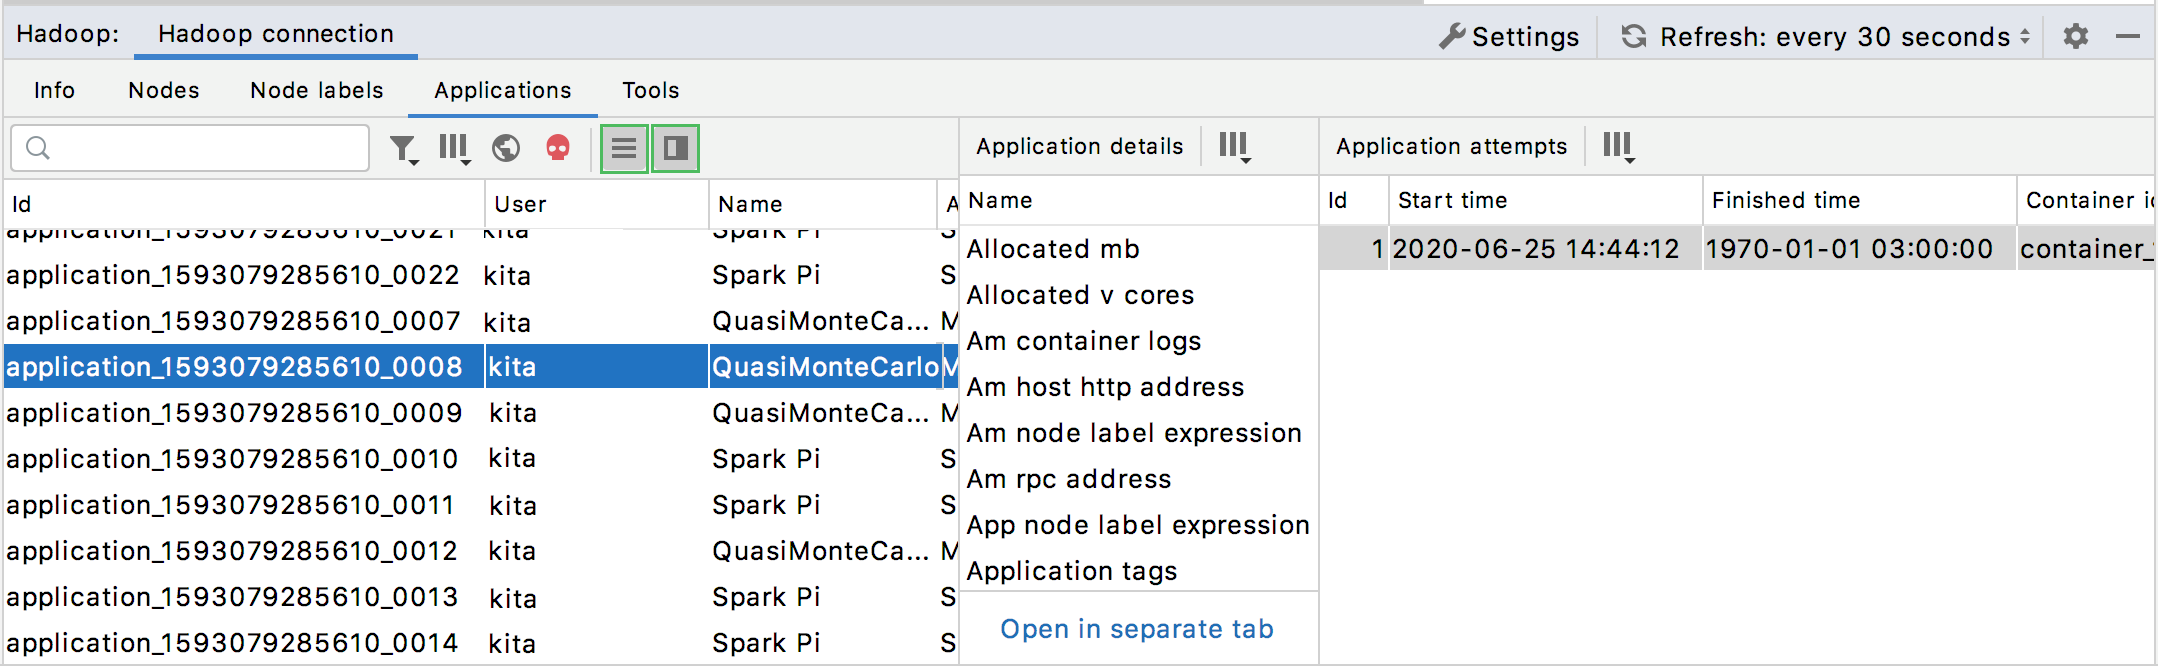 Showing application details